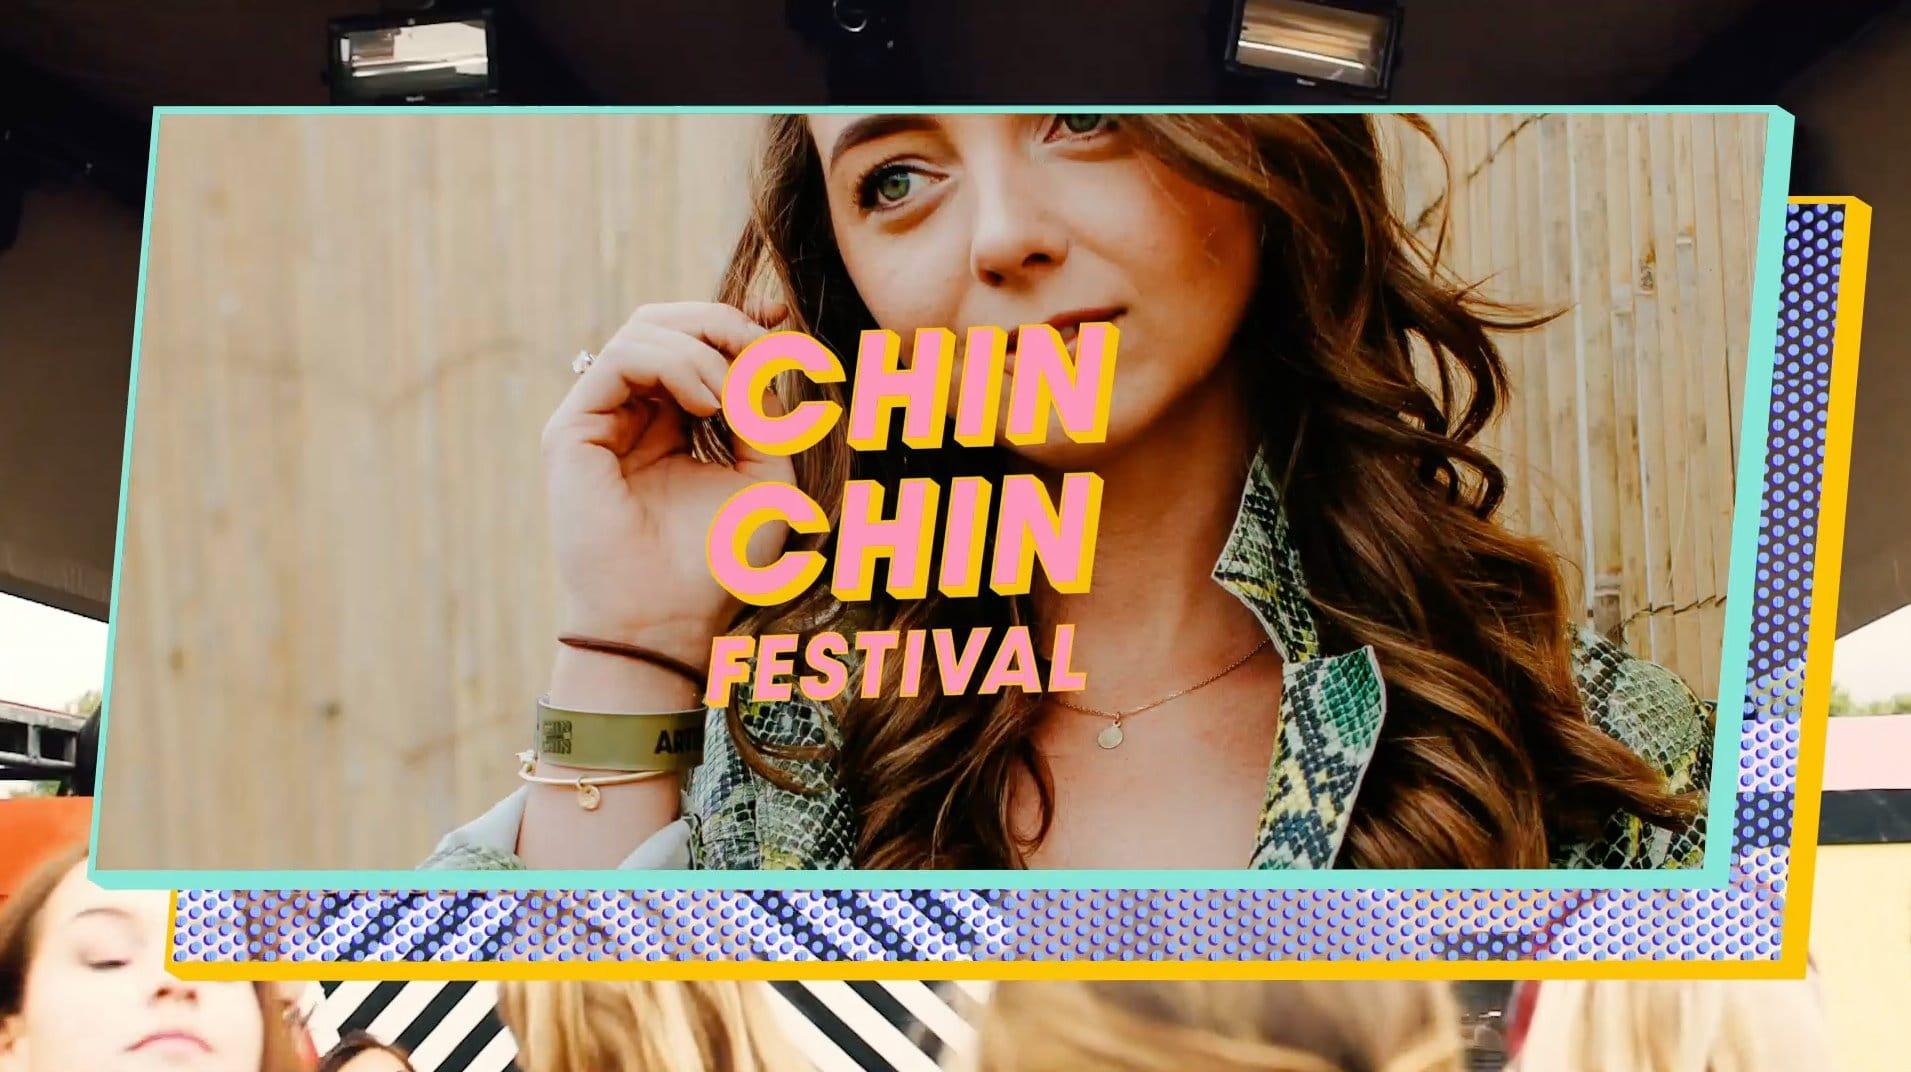 Chin Chin Club Festival 2021